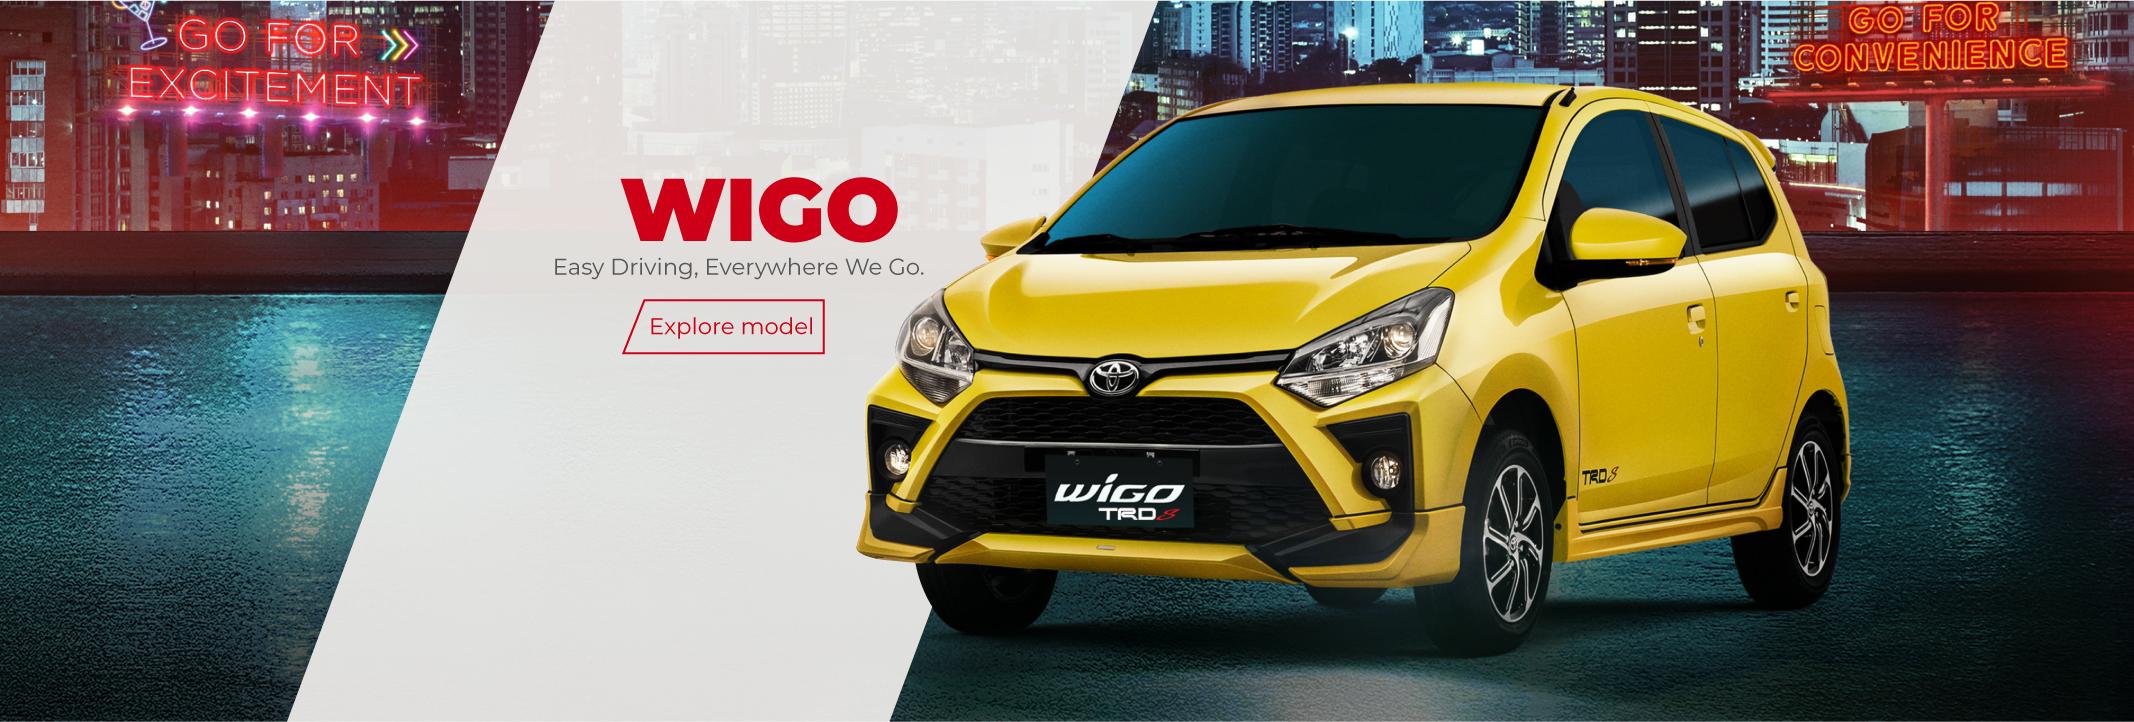 Wigo Tablet Banner